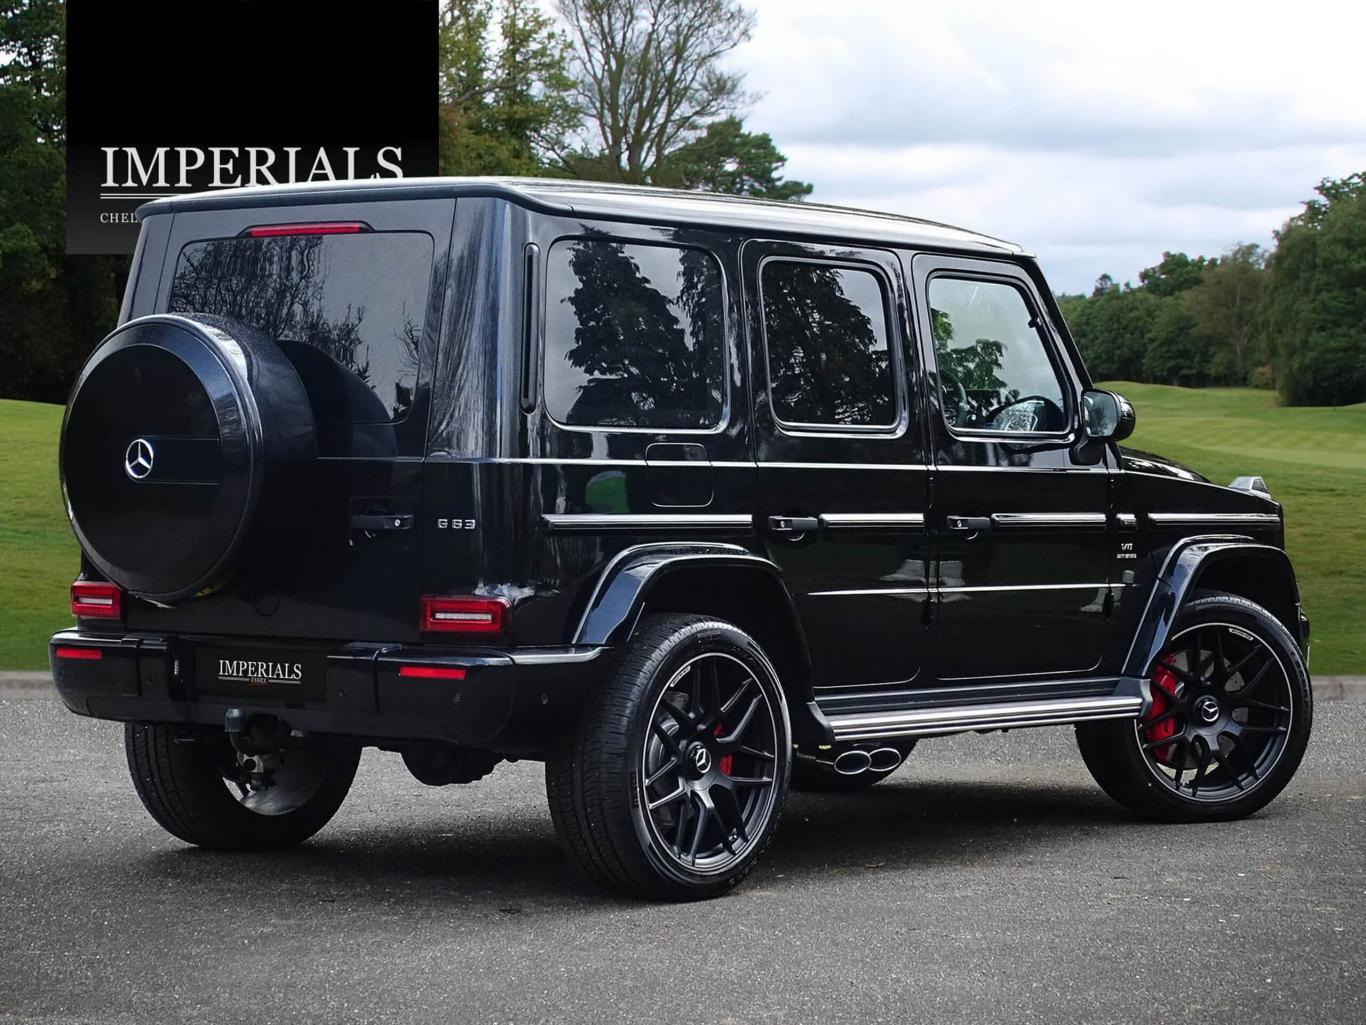 Mercedes Benz G63 >> Mercedes Benz G63 Amg 40 V8 New Model Vat Q 9 Speed 4x4 Obsidian Black Metallic Automatic Petrol